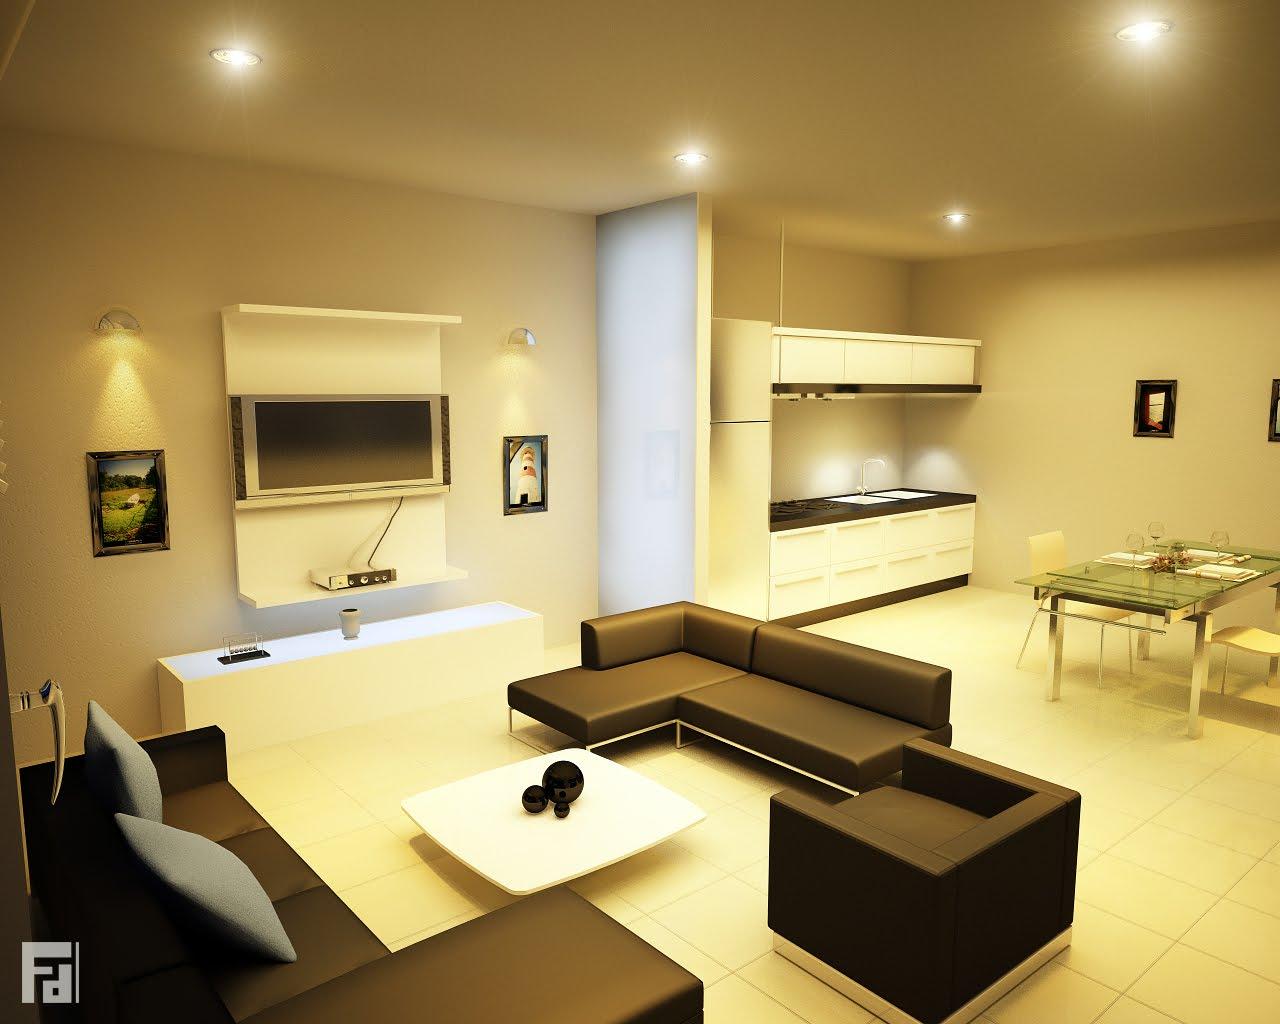 Fernando dur n portafolio interiores casa caceres - Casas de ensueno interiores ...